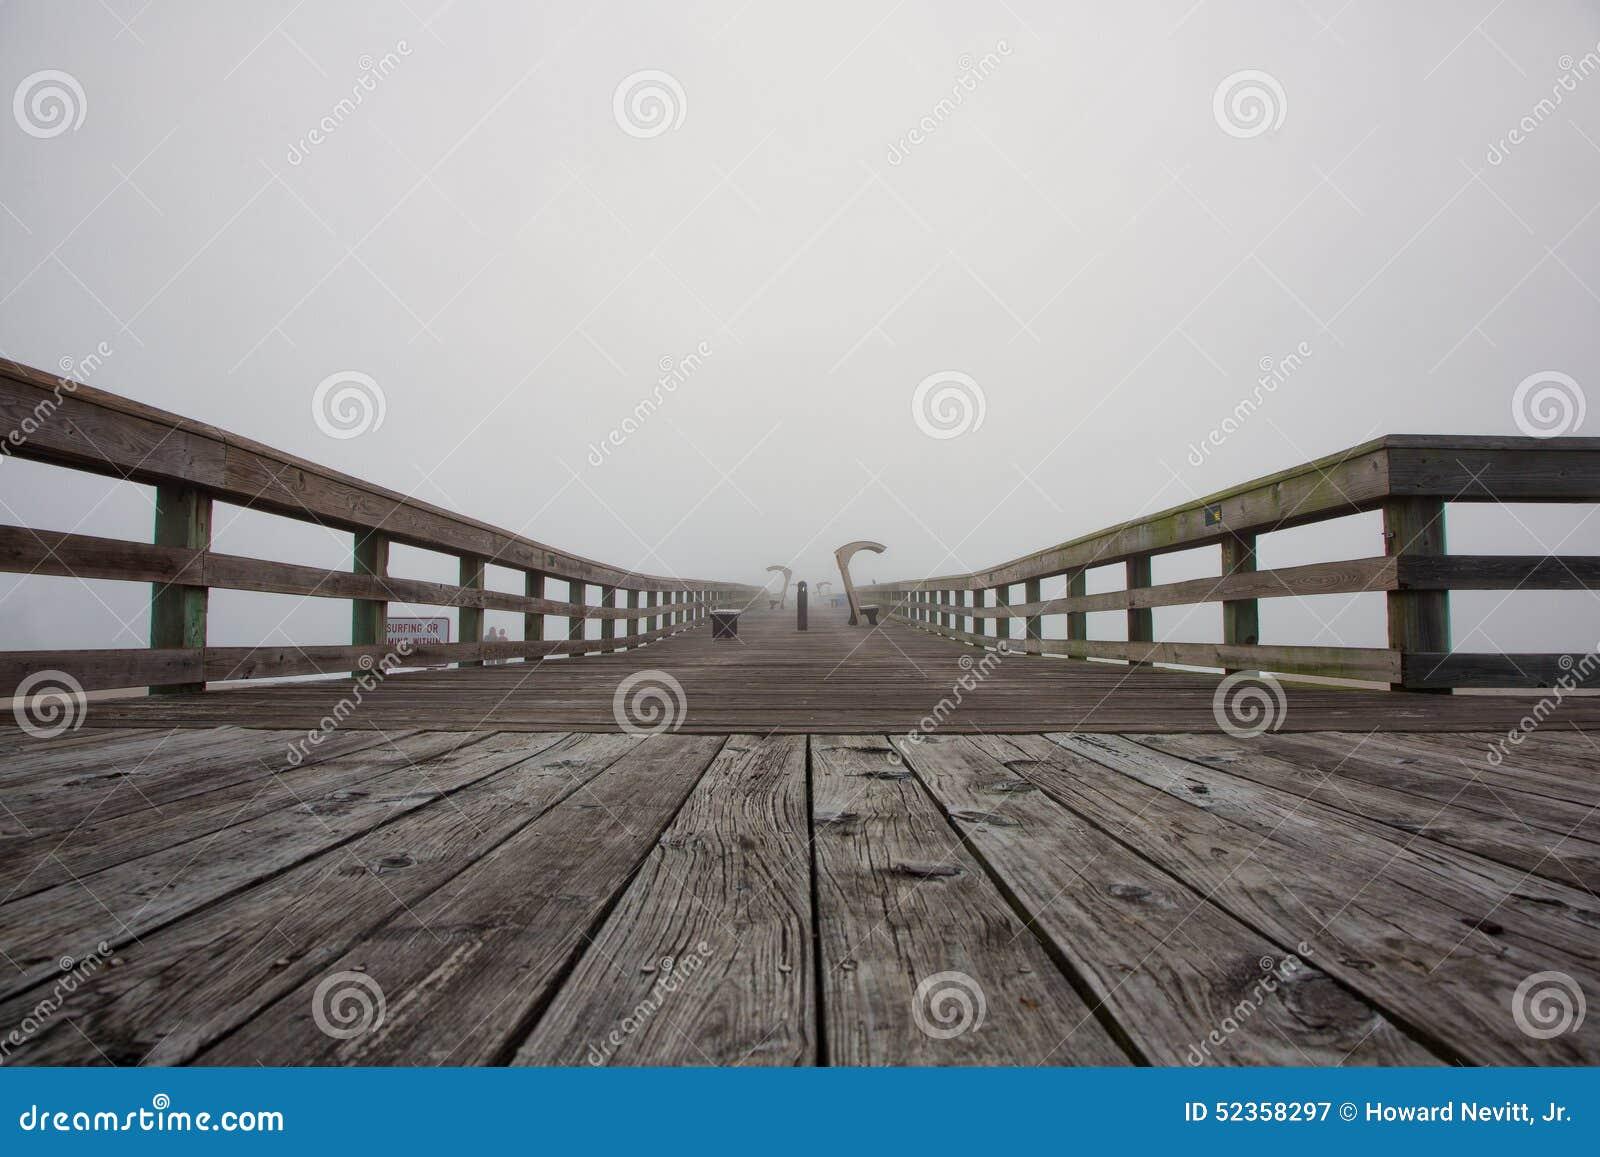 Foggy morning sunrise at pier.